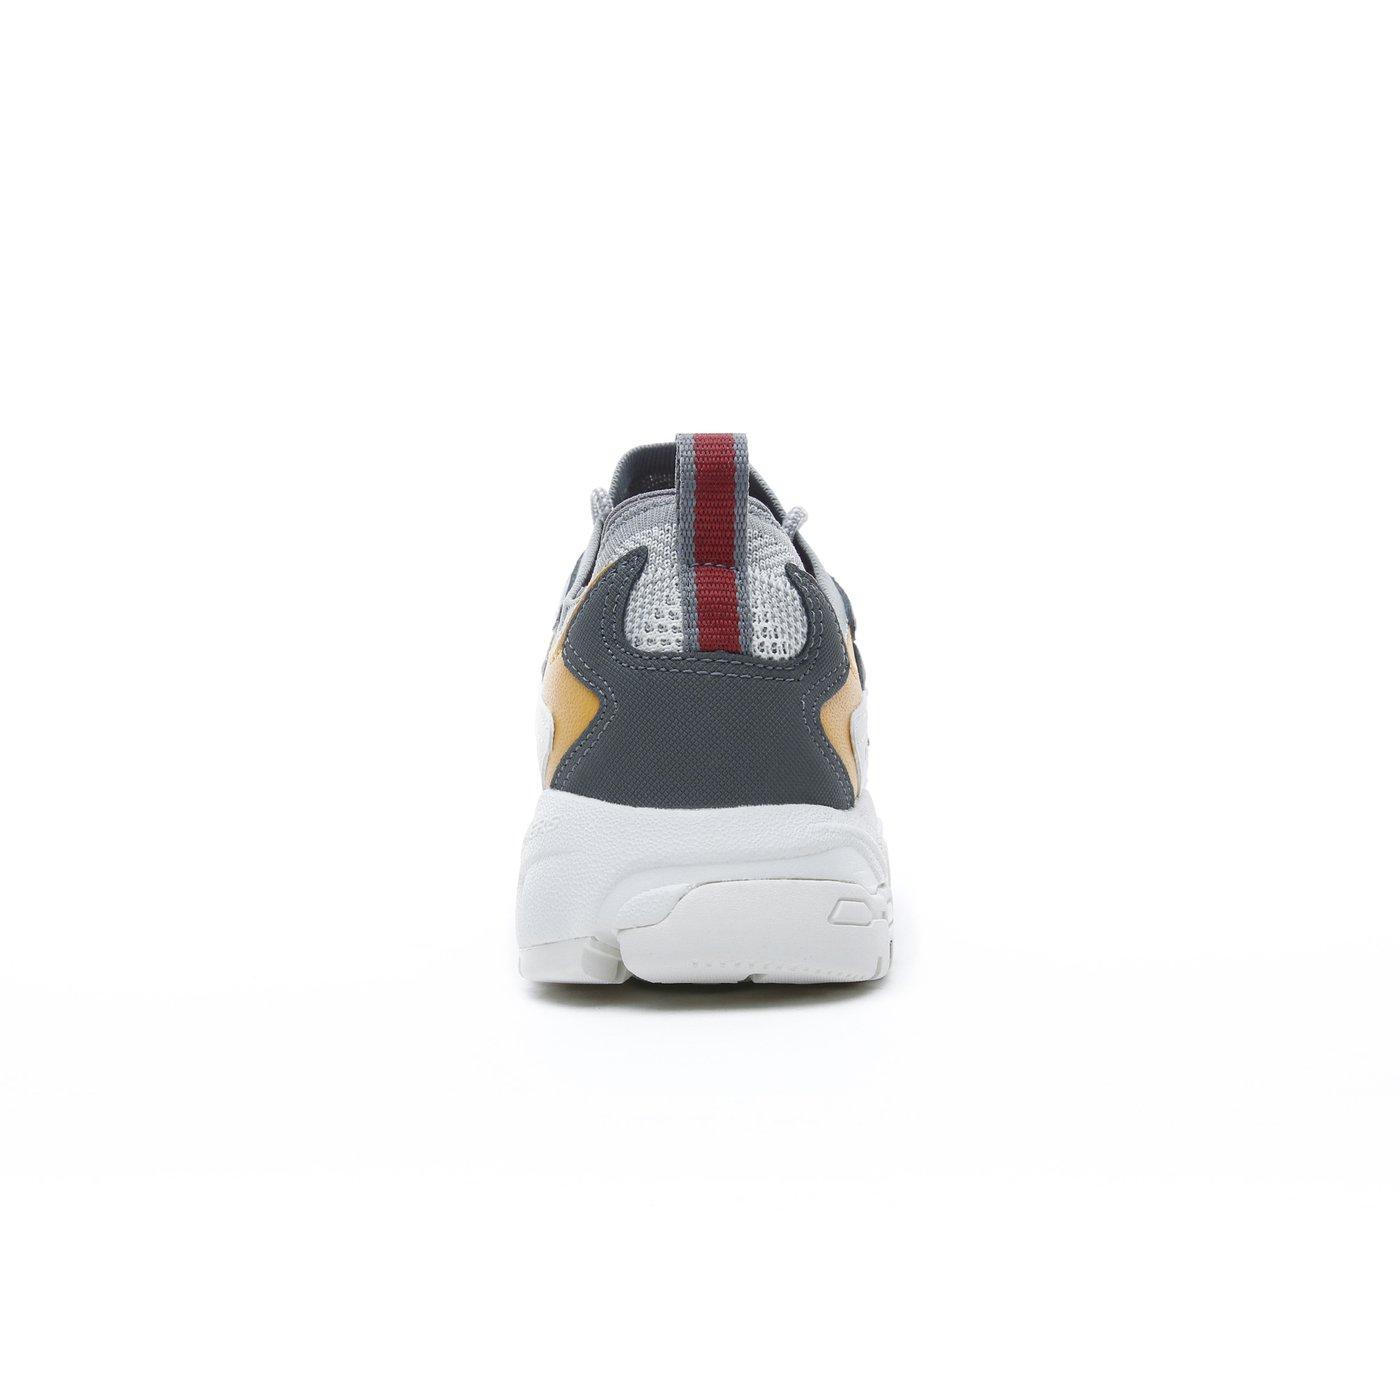 Skechers Stamina 2.0 - Berendo Erkek Gri Spor Ayakkabı